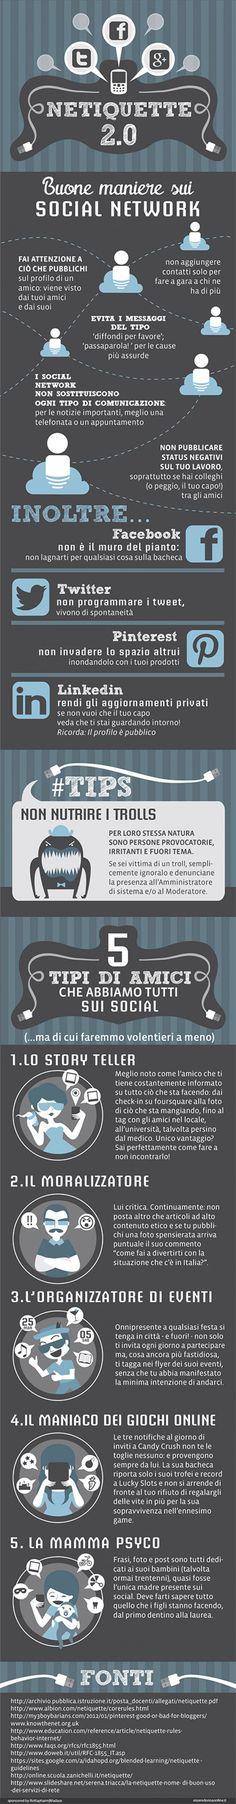 Netiquette 2.0: buone maniere sui social network - infographics designed for esseredonnaonline.it- illustrated by Alice Kle Borghi, kleland.com